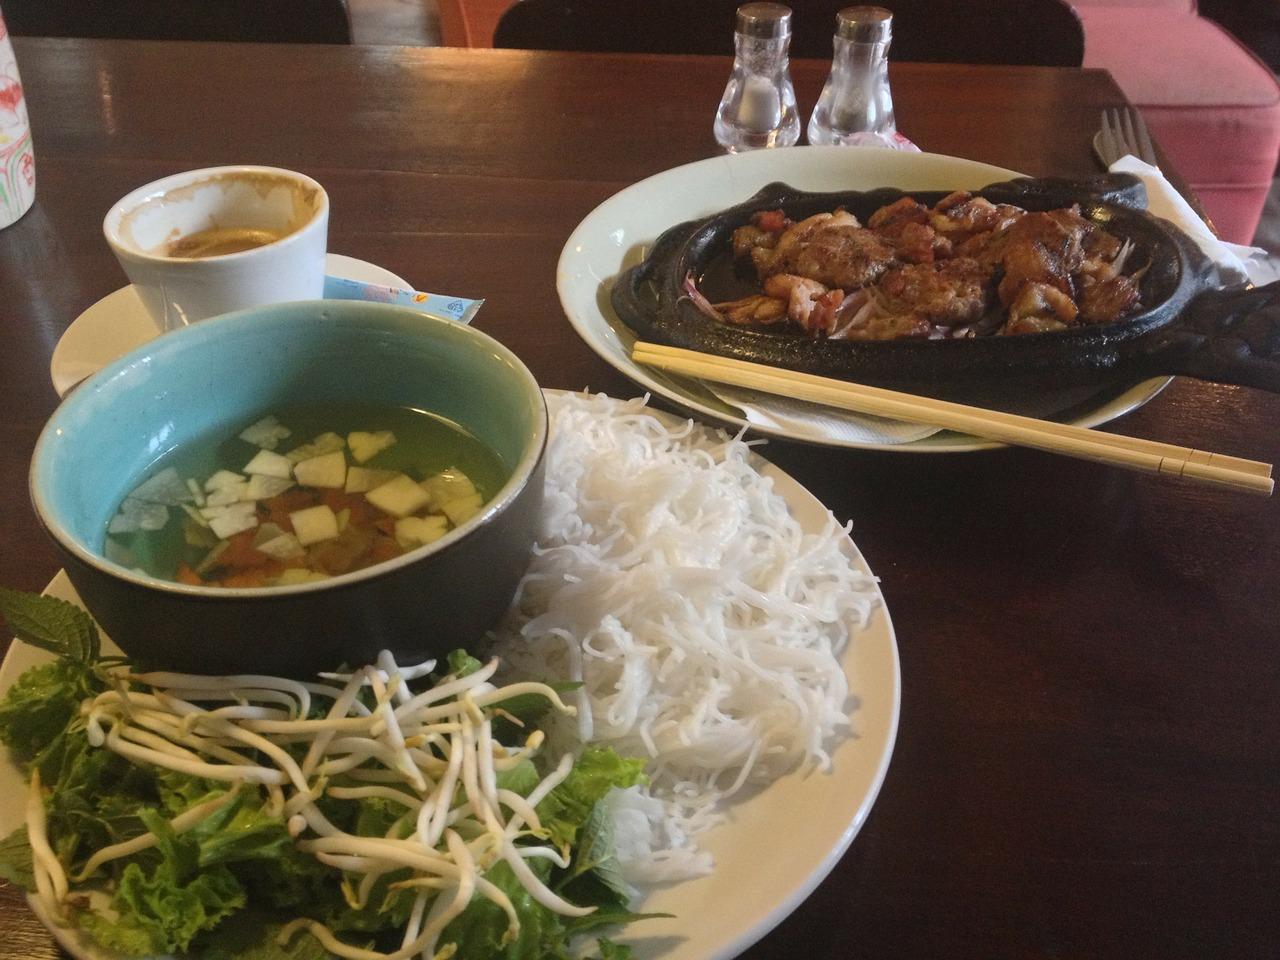 Restaurant asiatique Saveurs D'Asie